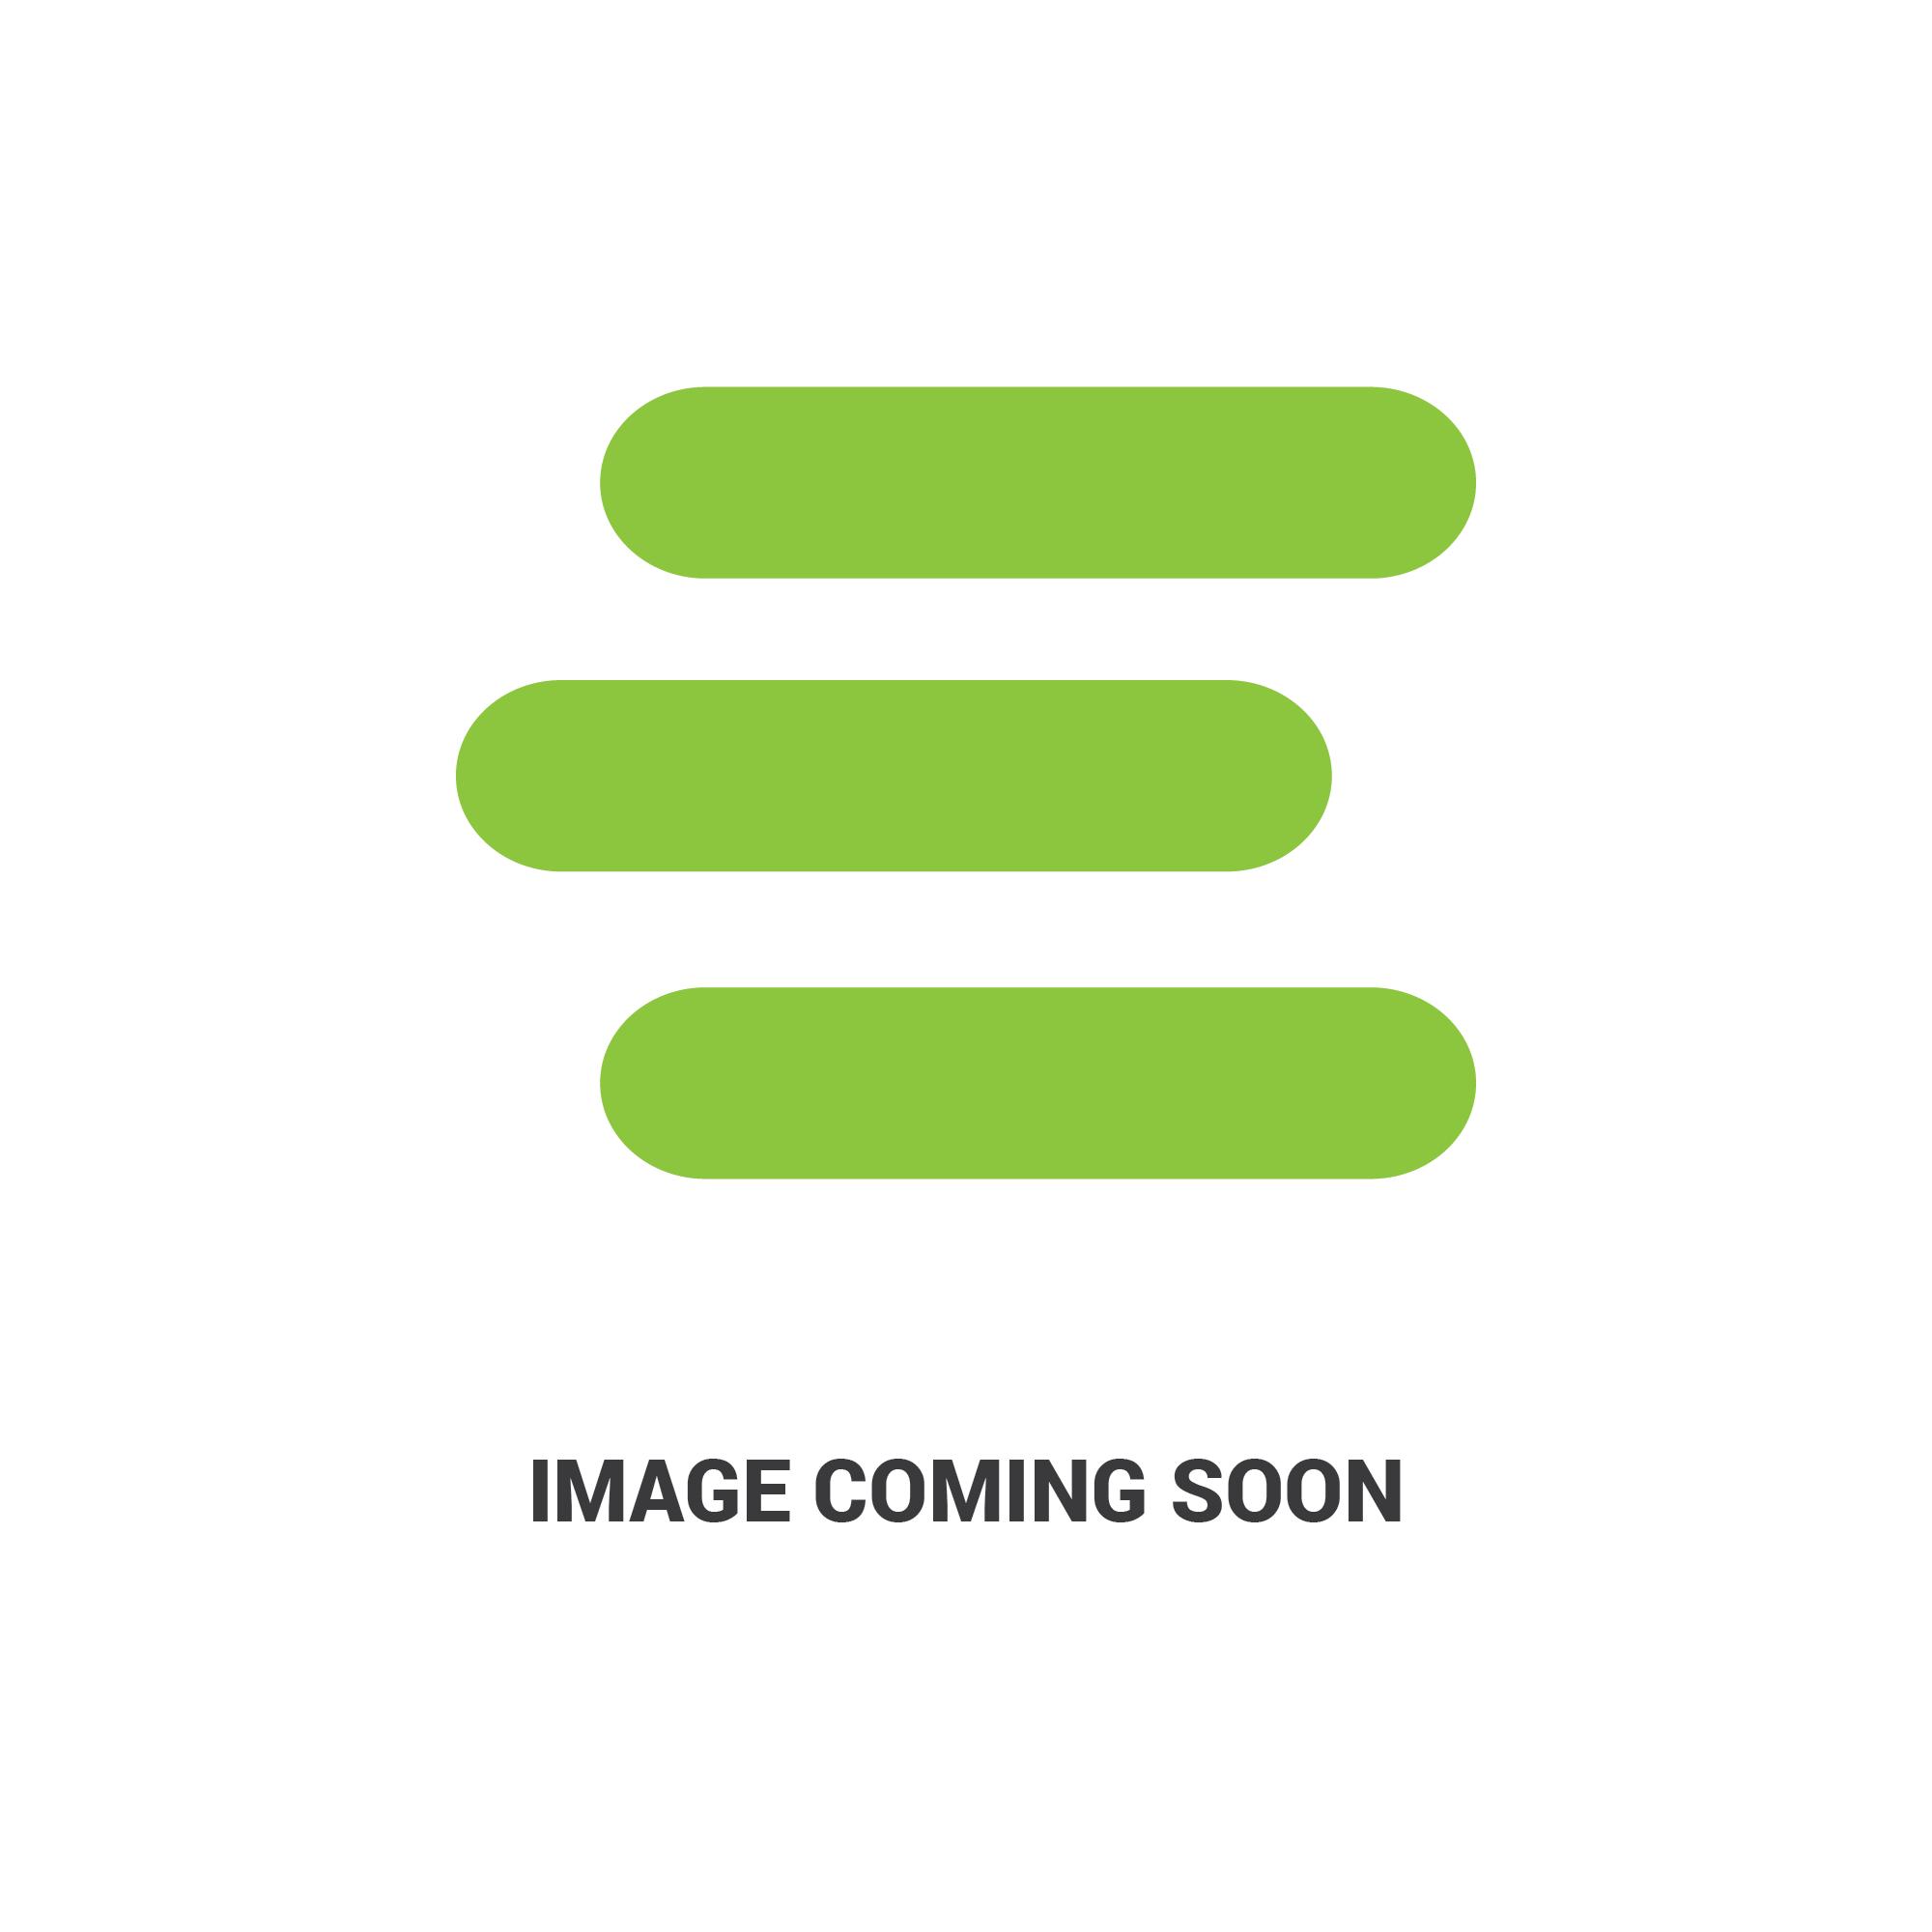 E-36330-651301280_1.jpg